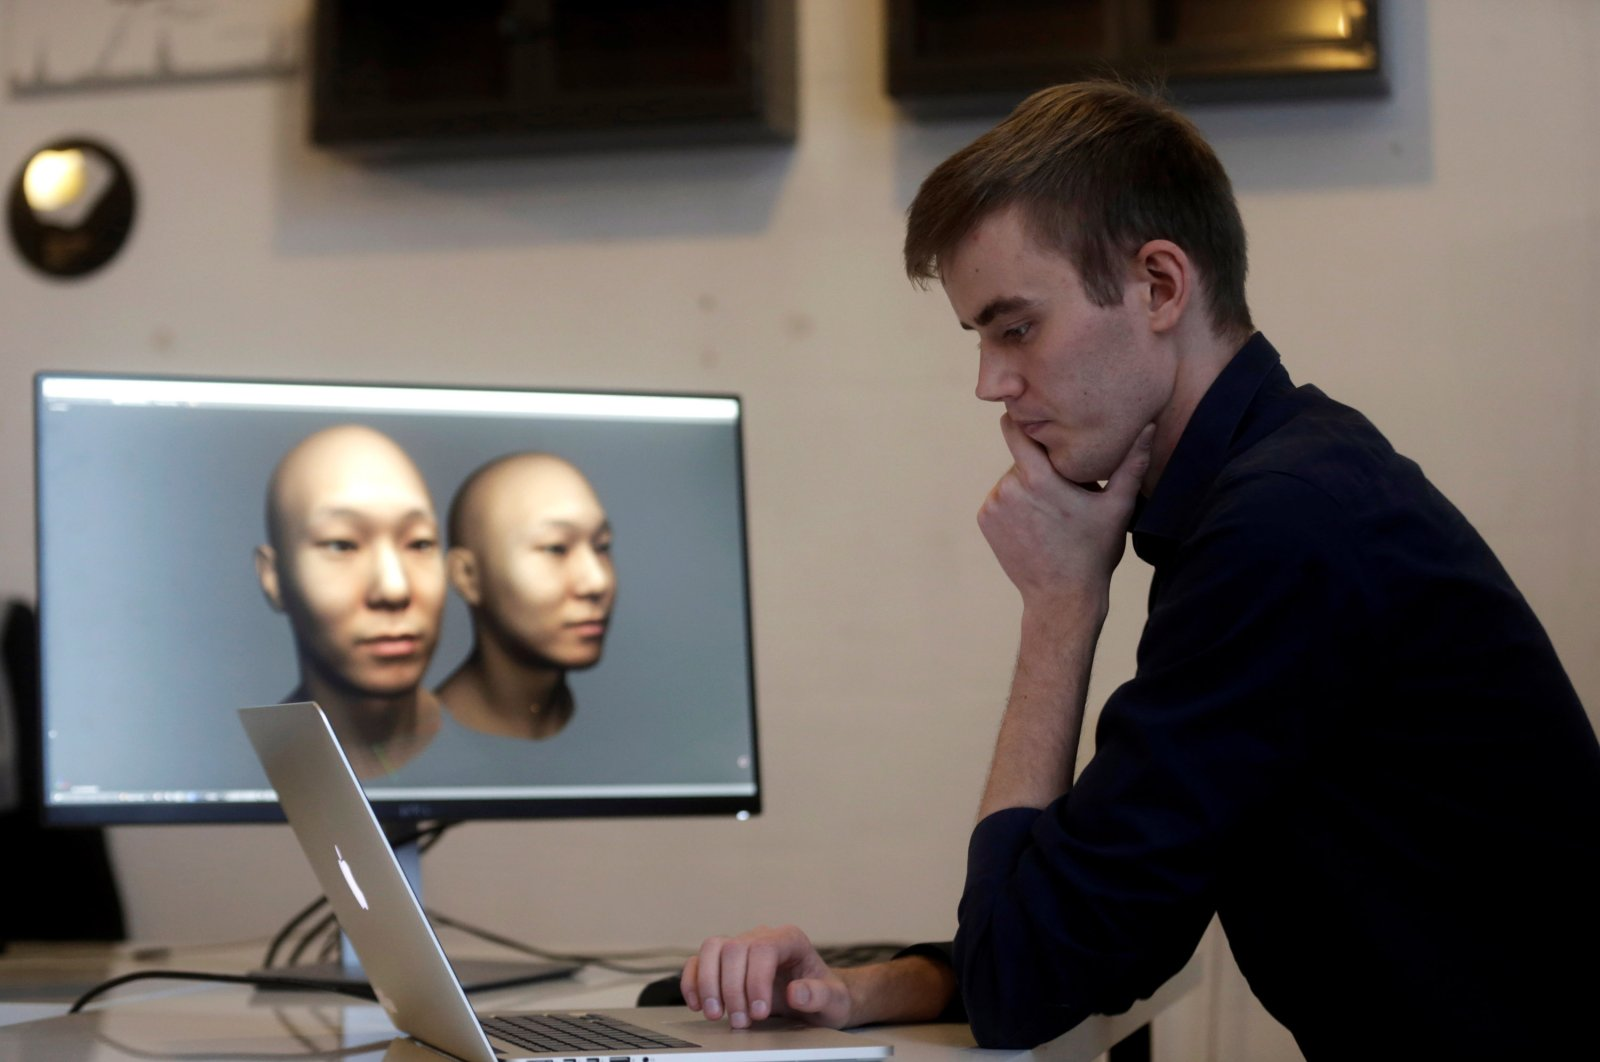 Rainer Selvet inspects 3D virtual reality renderings in Tallinn, Estonia, Nov. 8, 2016. (Reuters Photo)